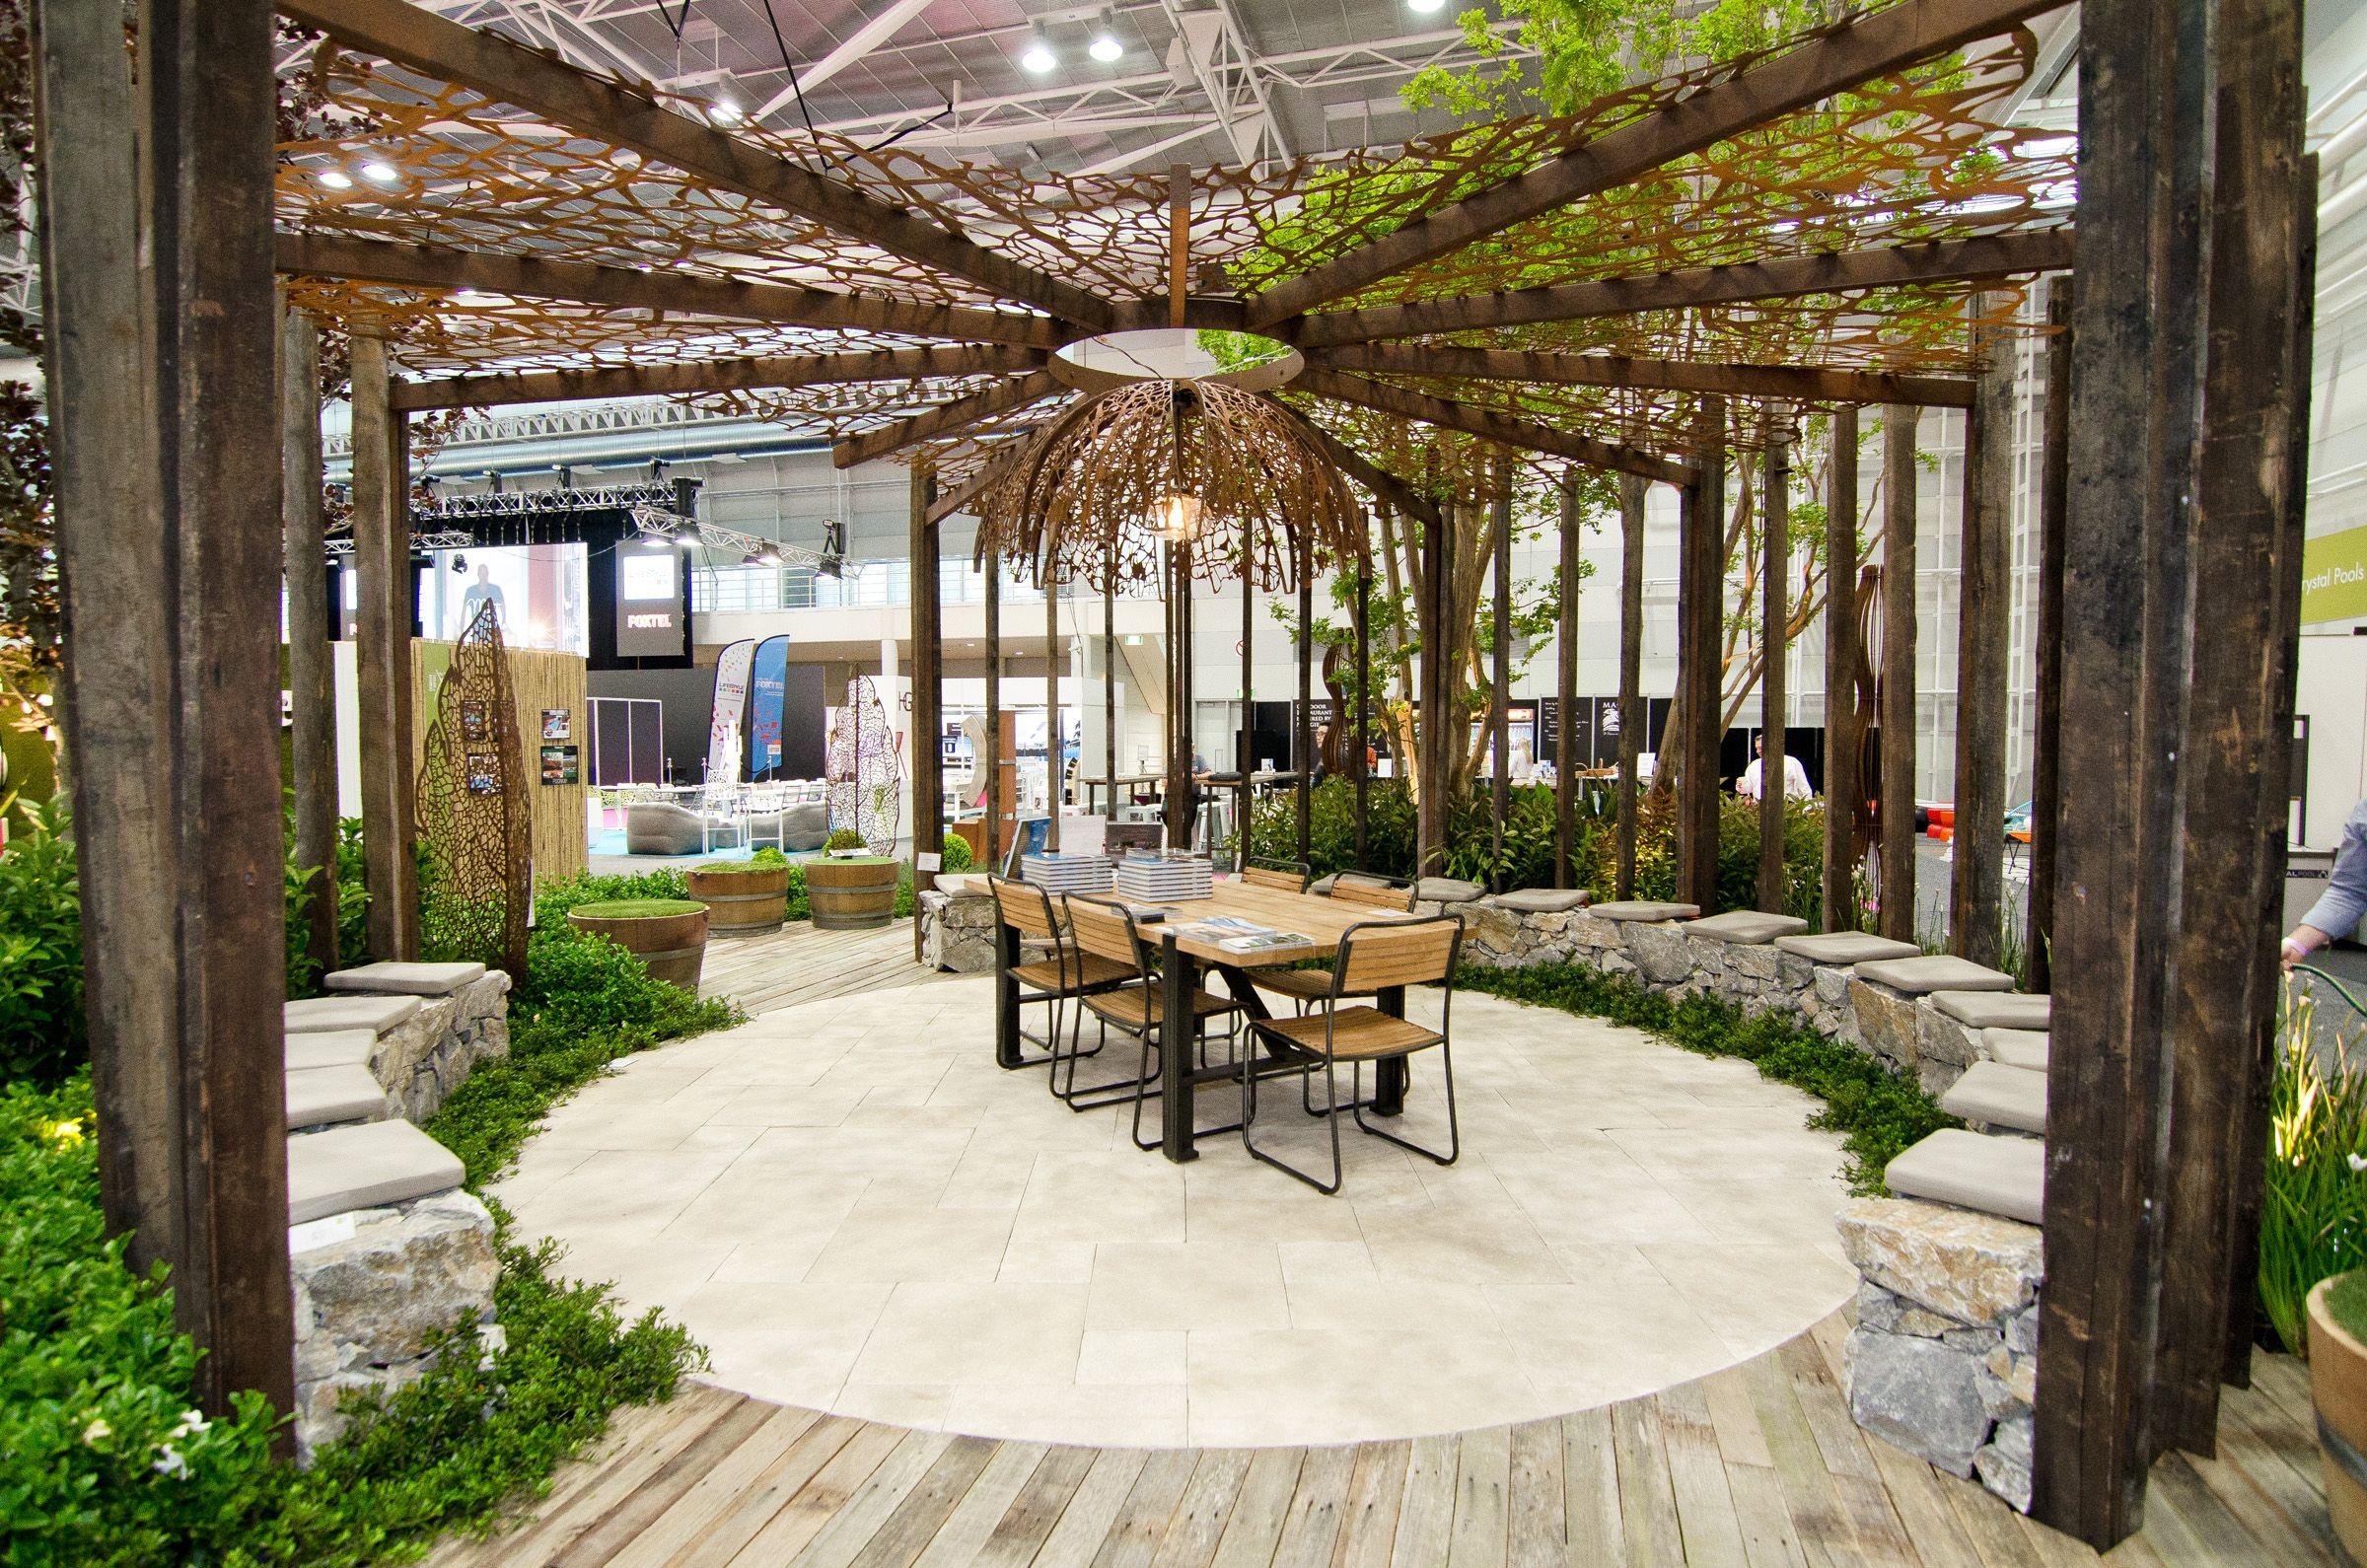 the rolling stone landscapes outdoor theatre designed by dean, Garten dekoo